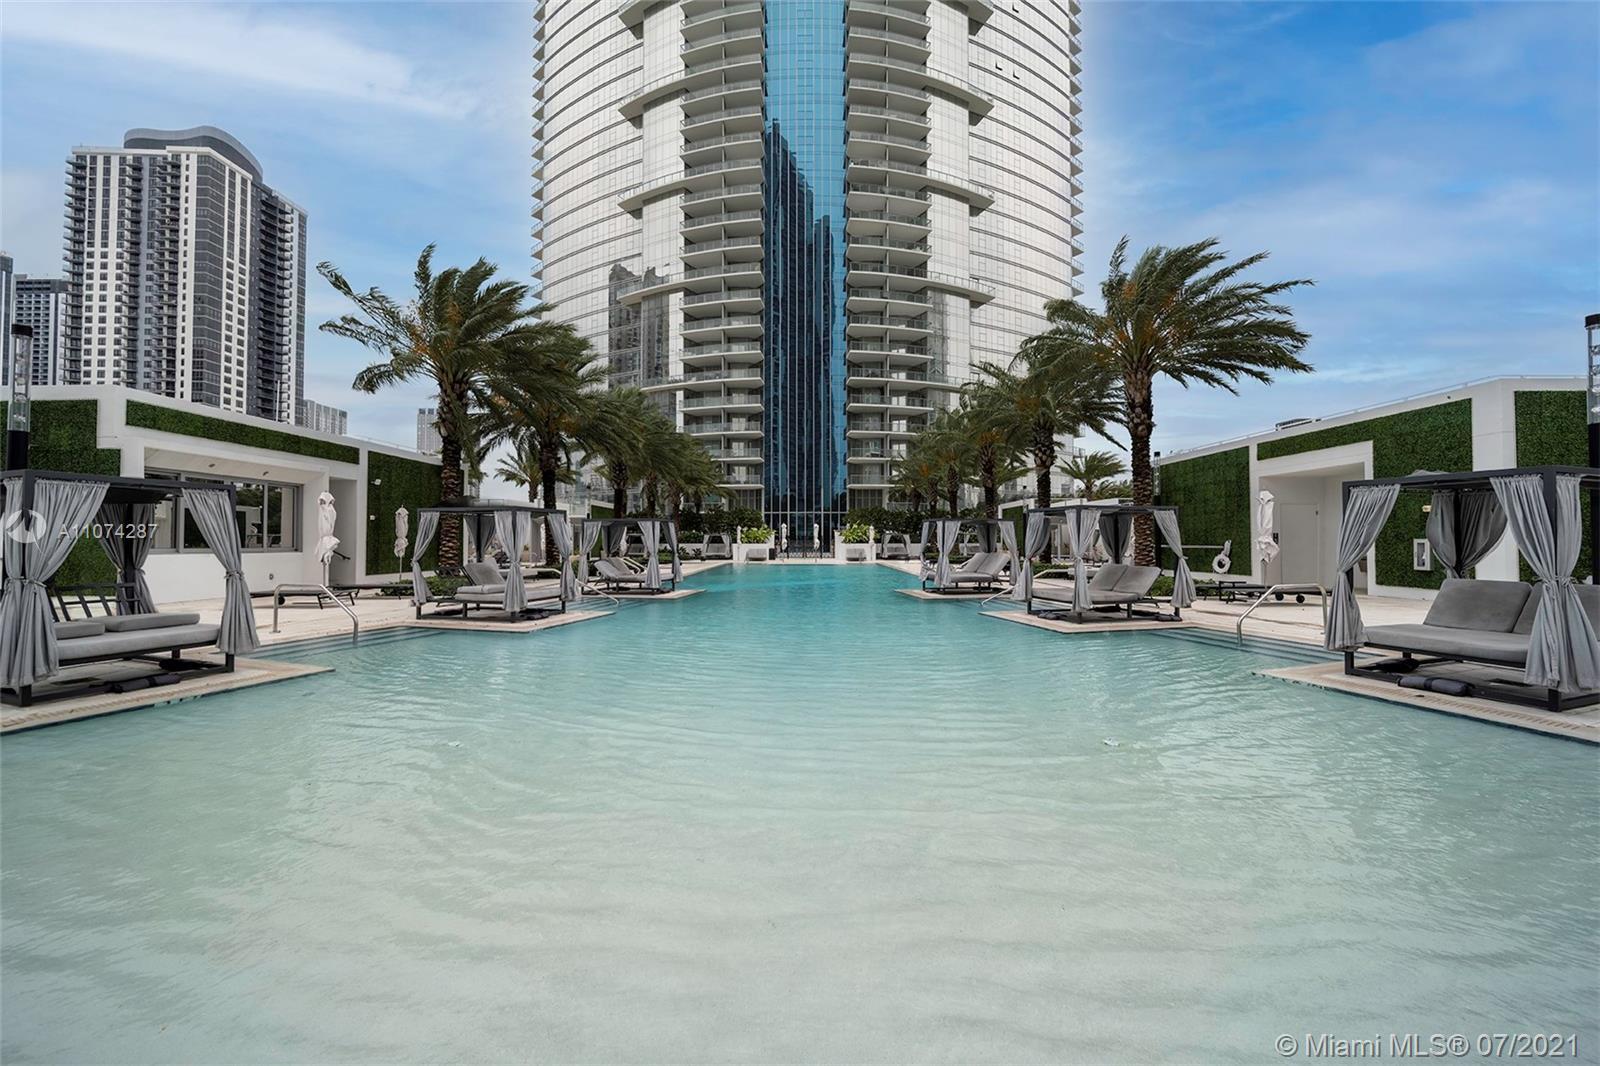 Photo of Paramount Miami Worldcent Apt 4303